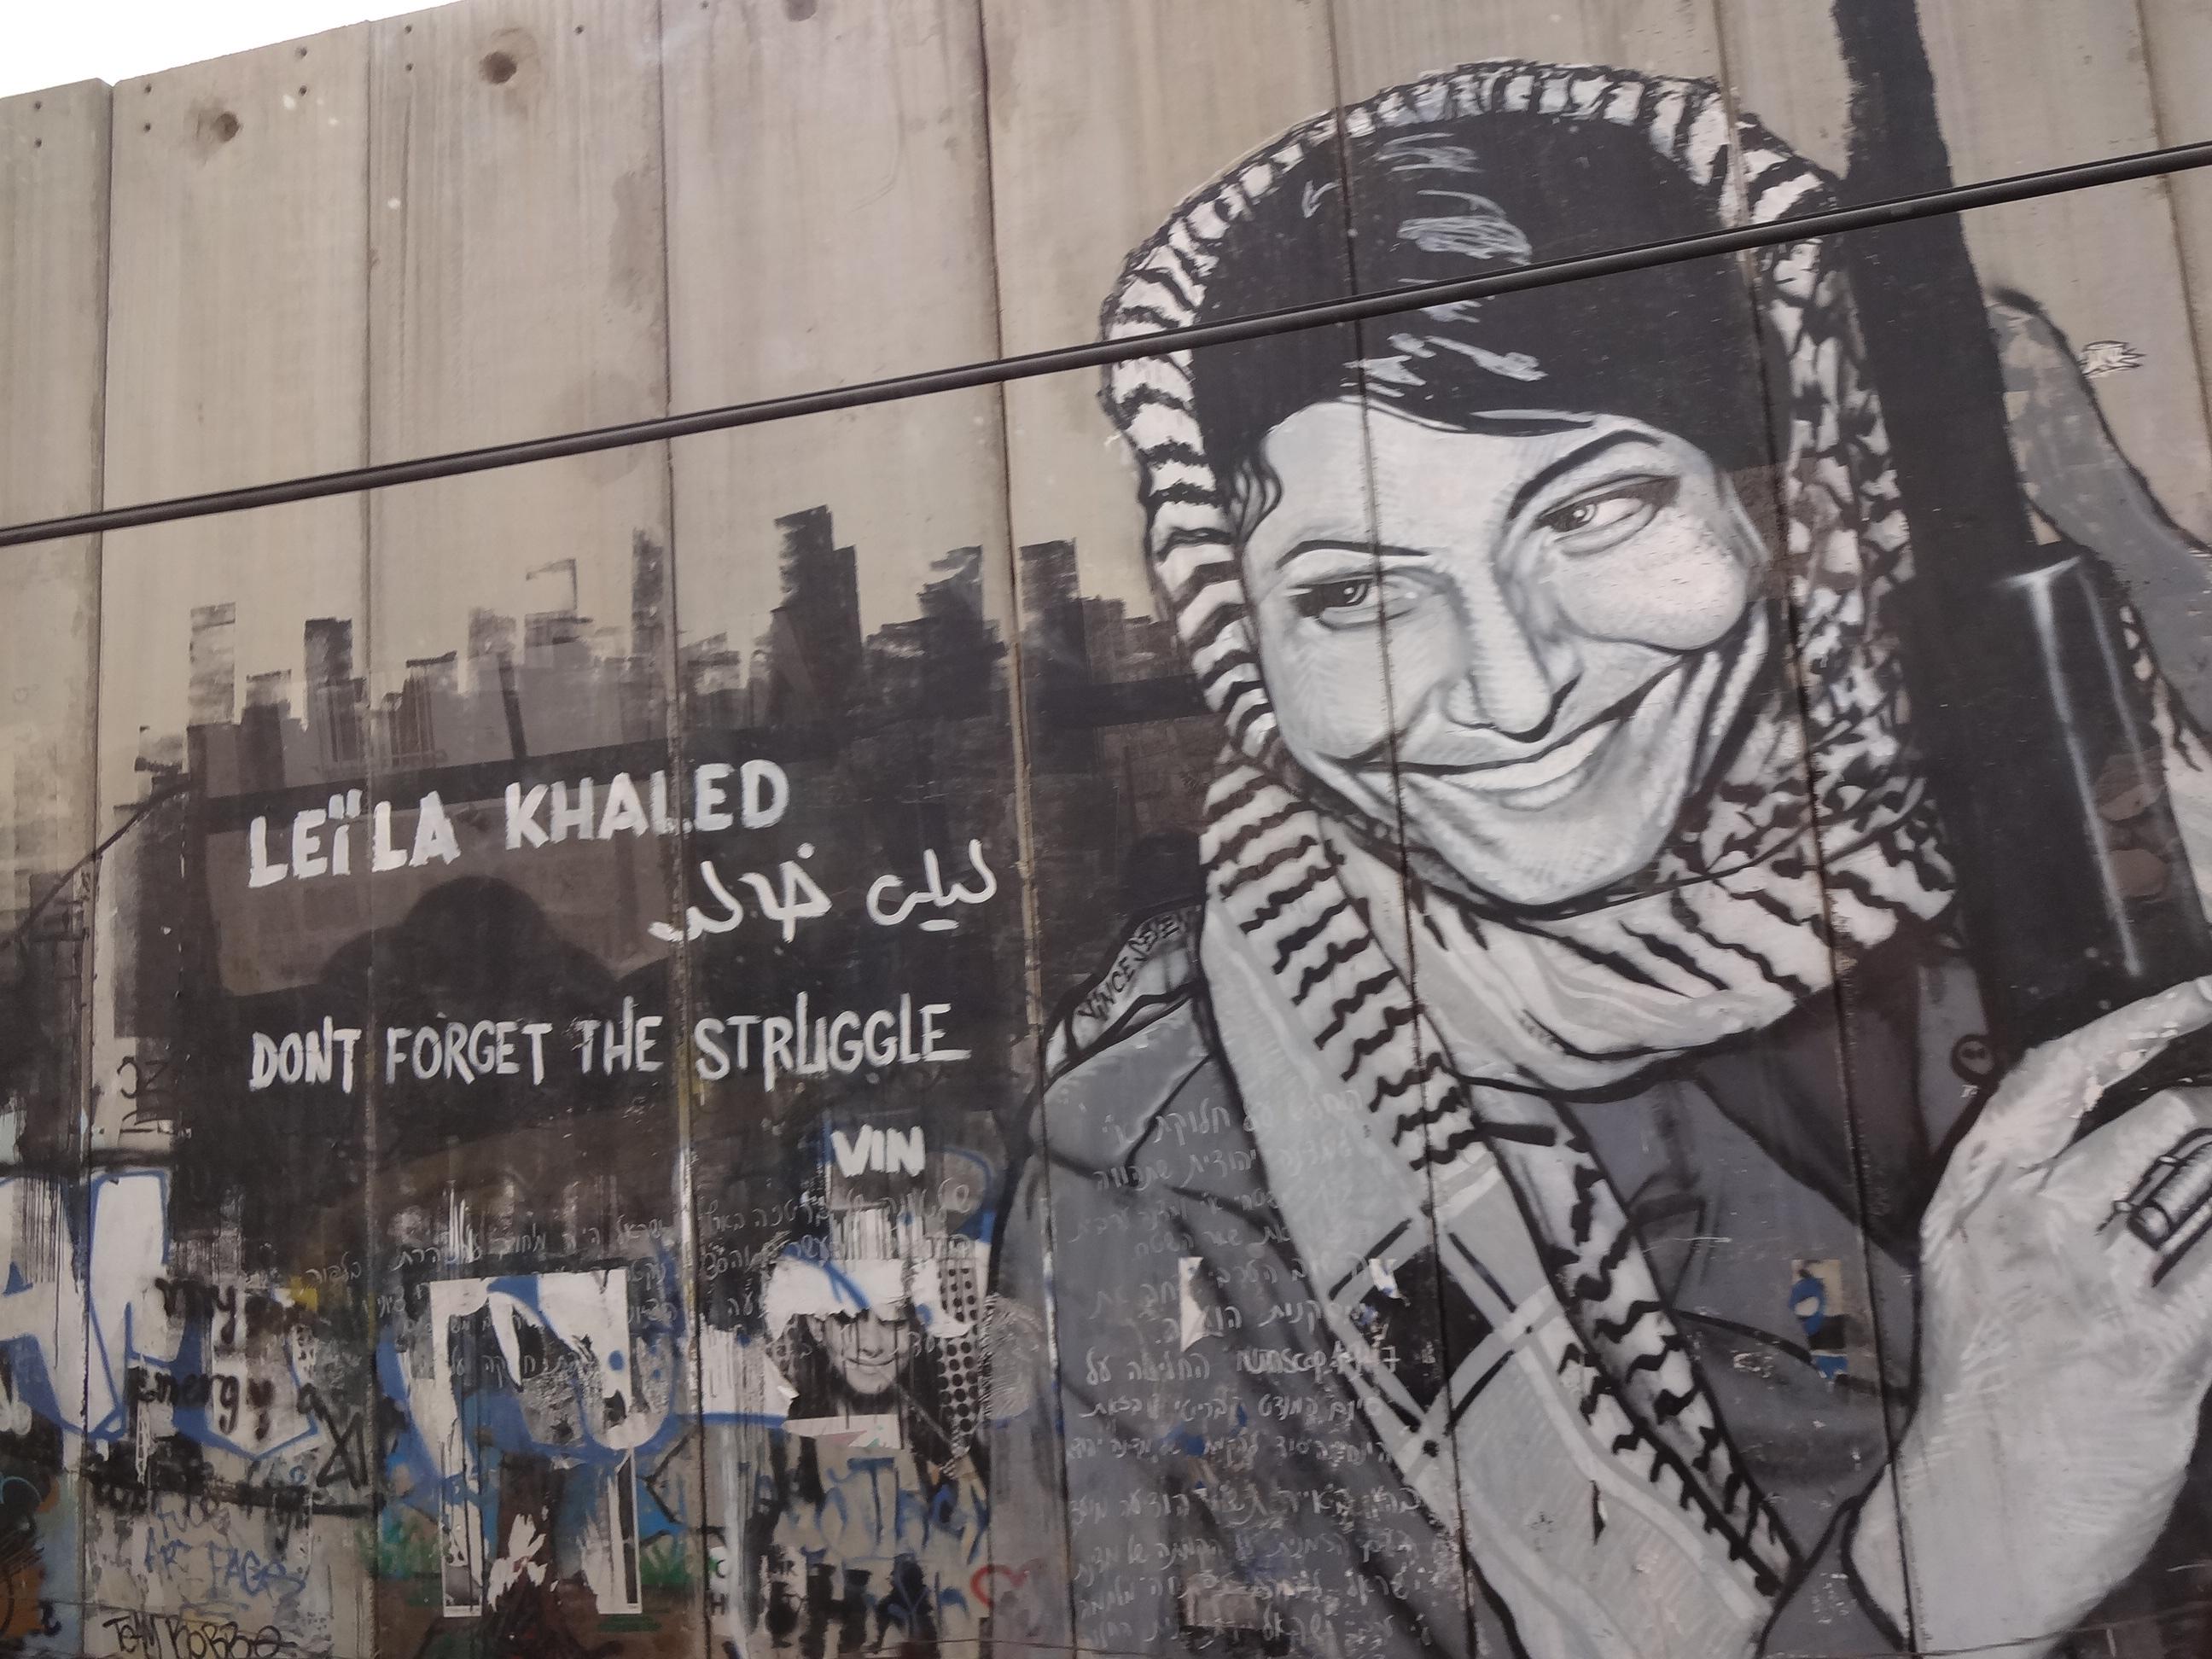 symbols of antisemitism - kafiyeh